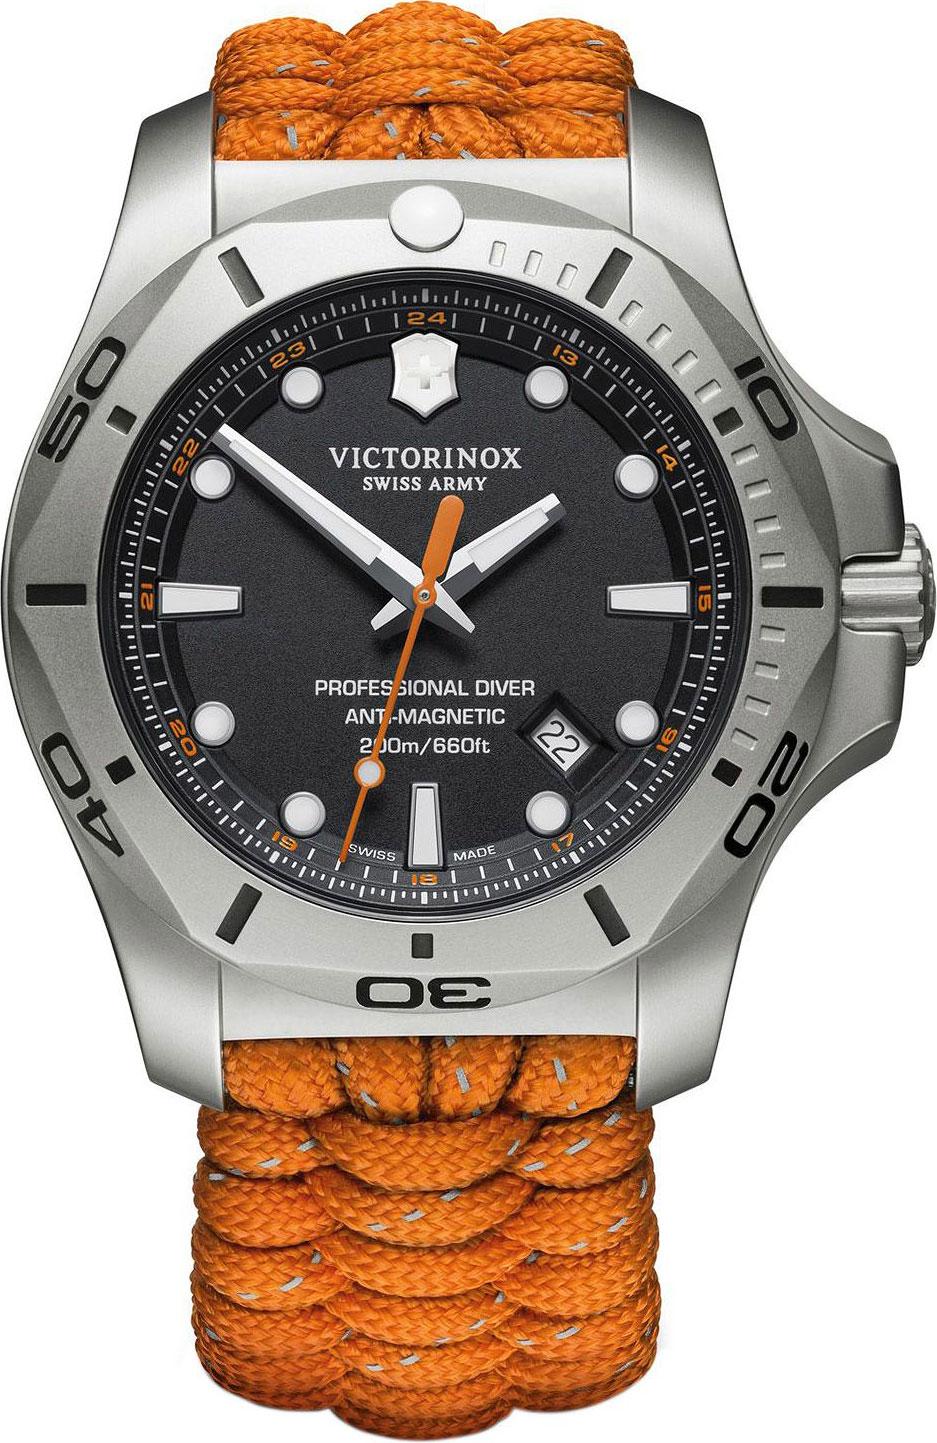 Мужские часы Victorinox 241845 ptfe nozzle feeding tube 2x4mm high temperature resistance for 3d printer wwo66